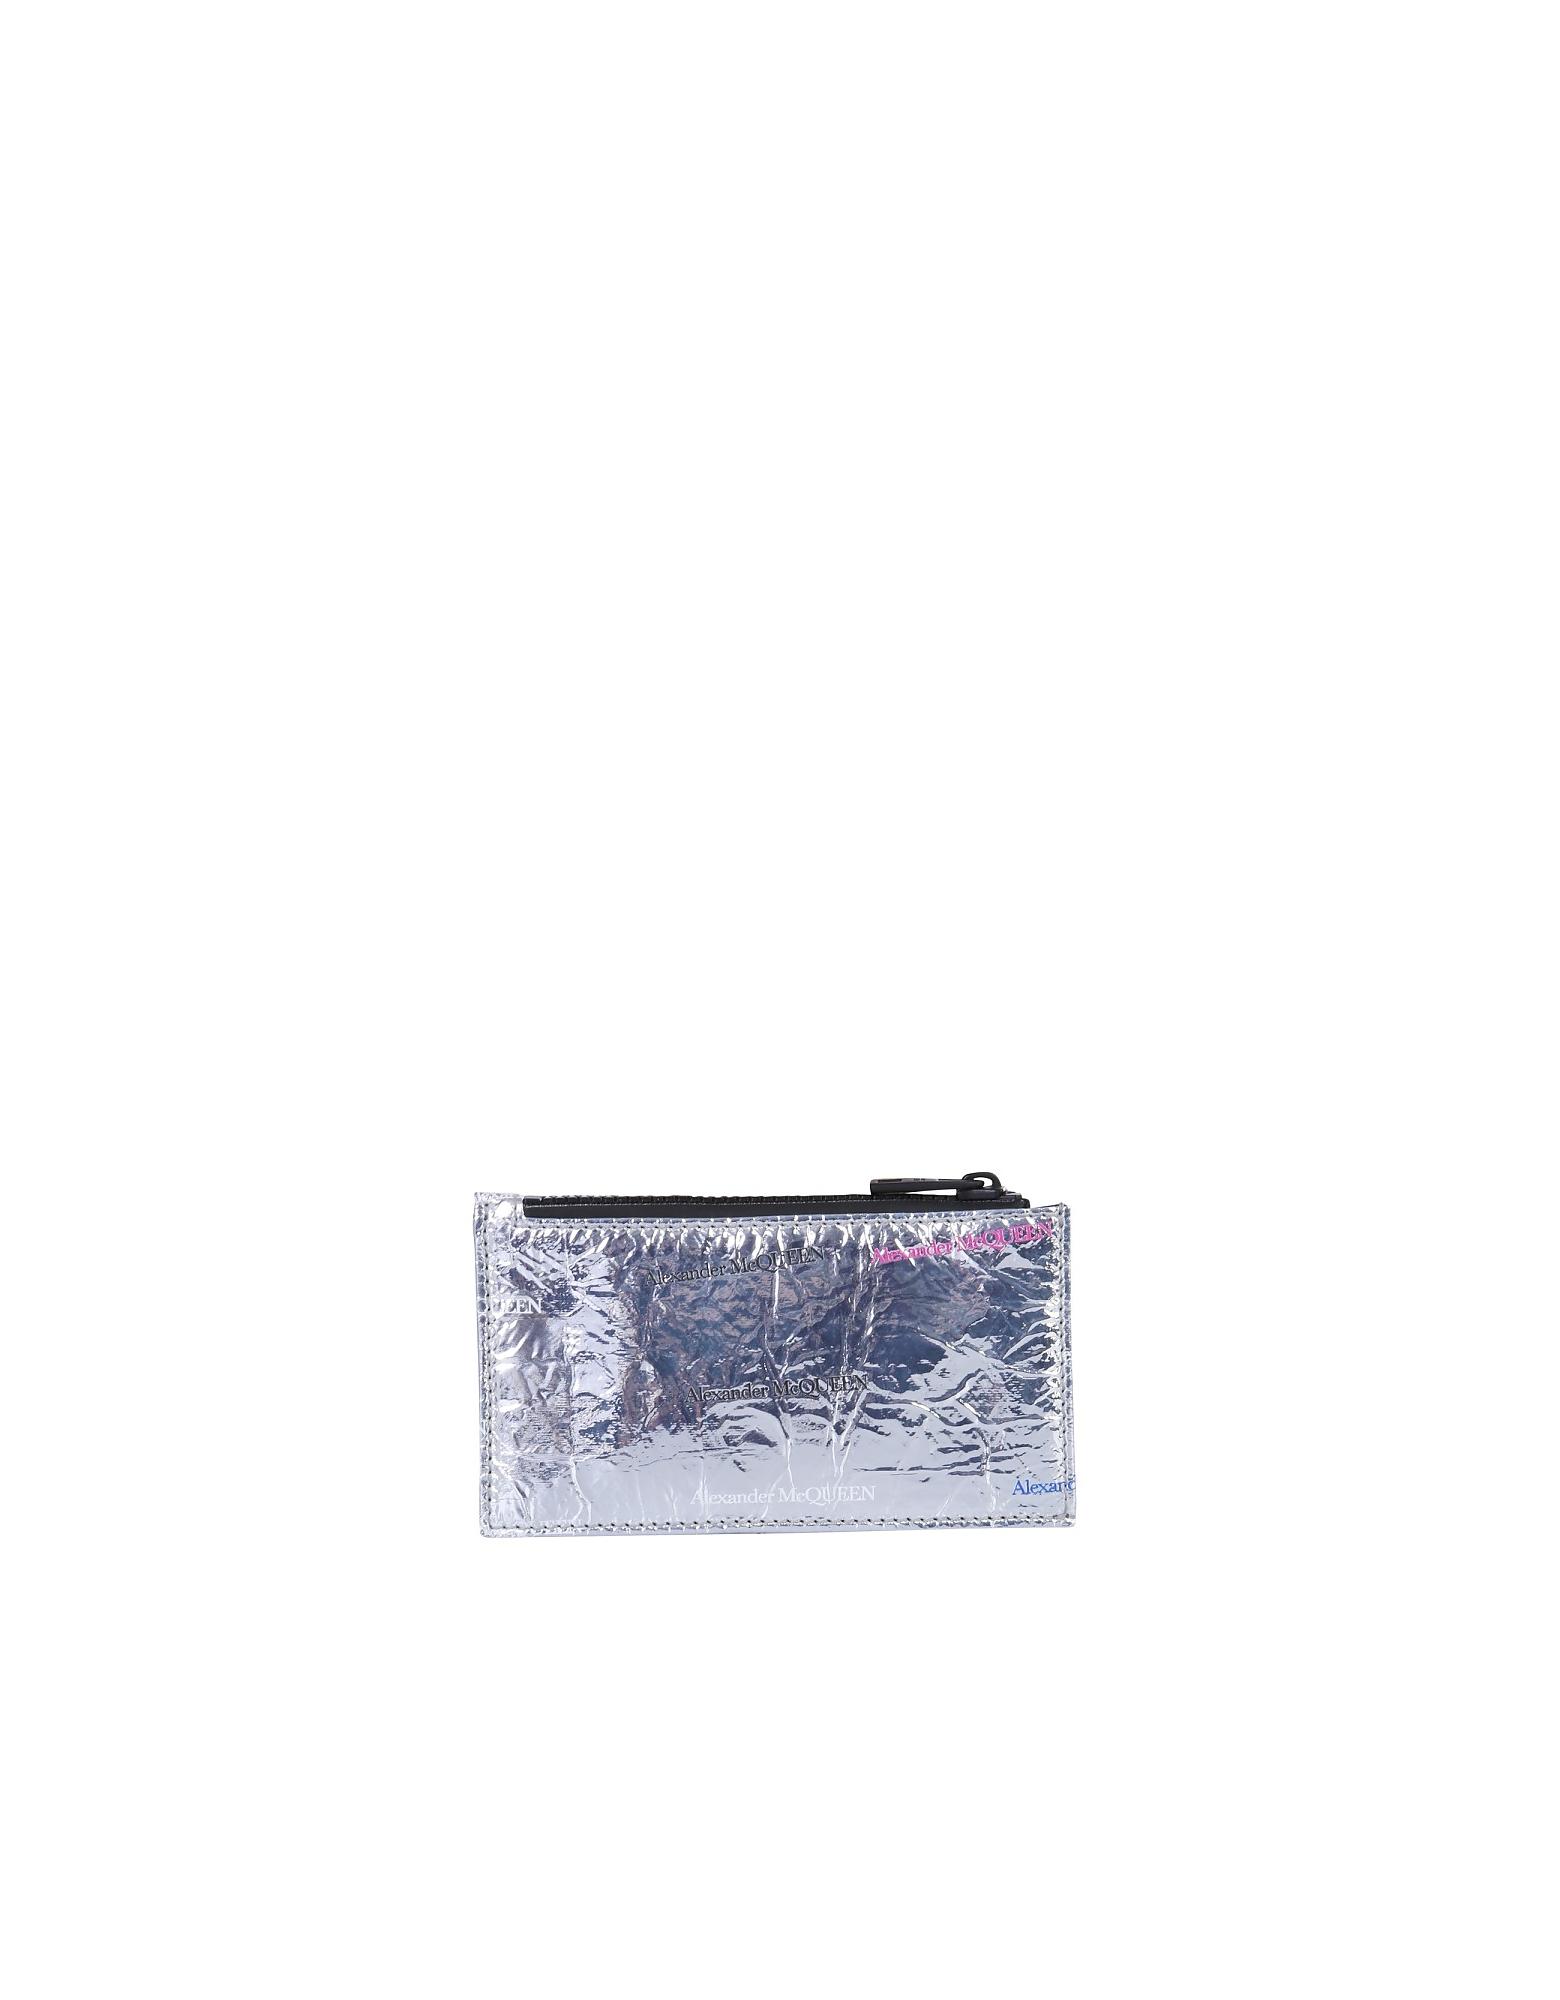 Alexander McQueen Designer Men's Bags, Card Holder With Logo